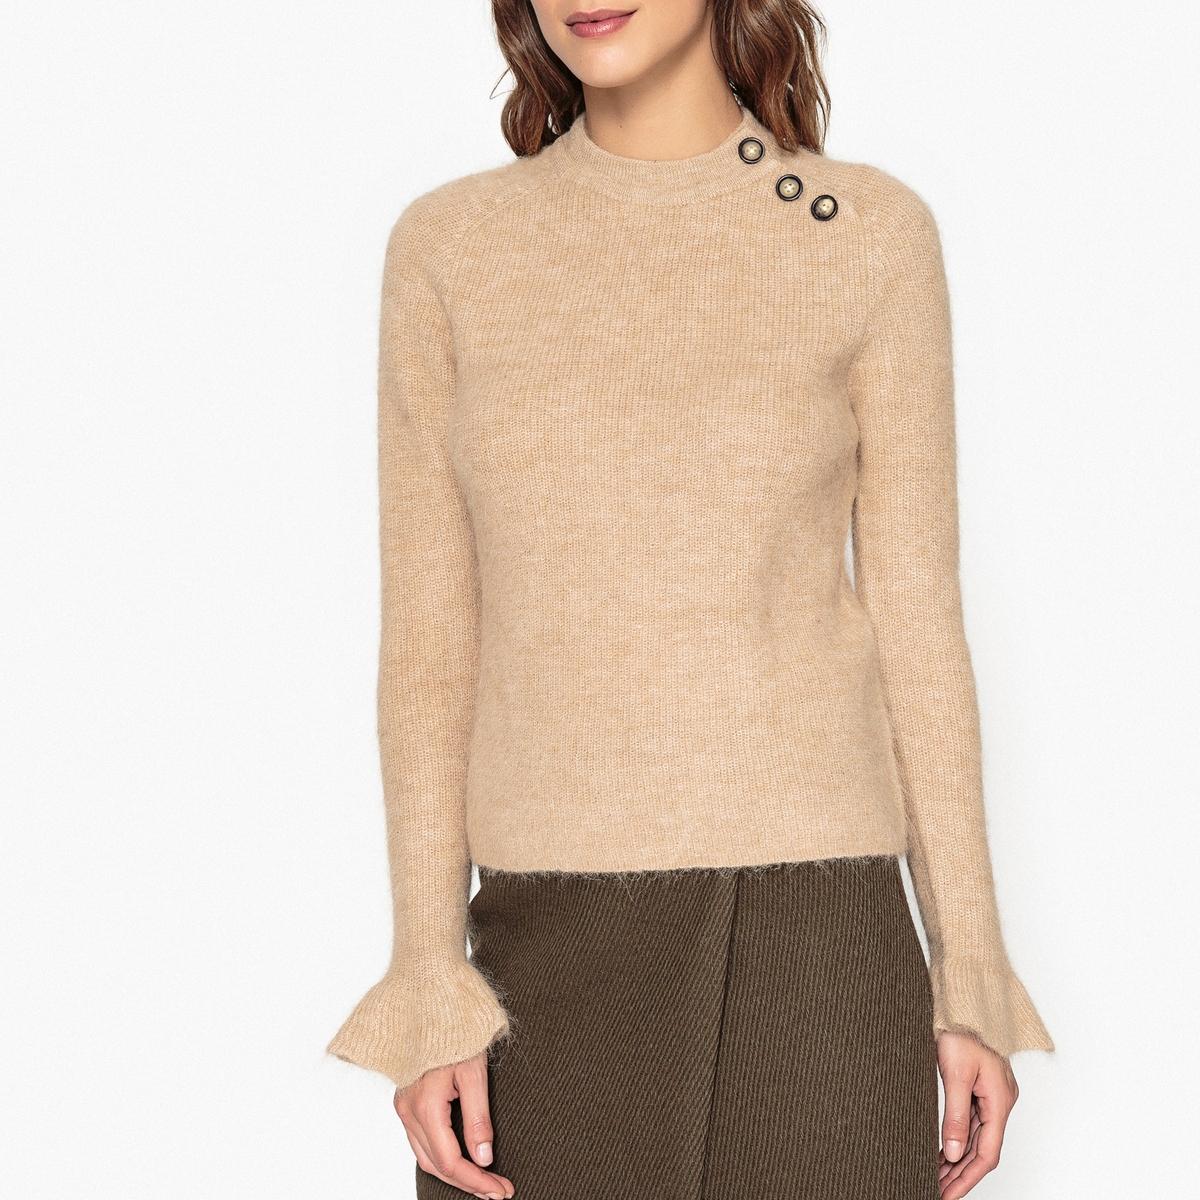 Пуловер с рукавами-воланами MUCHACHA